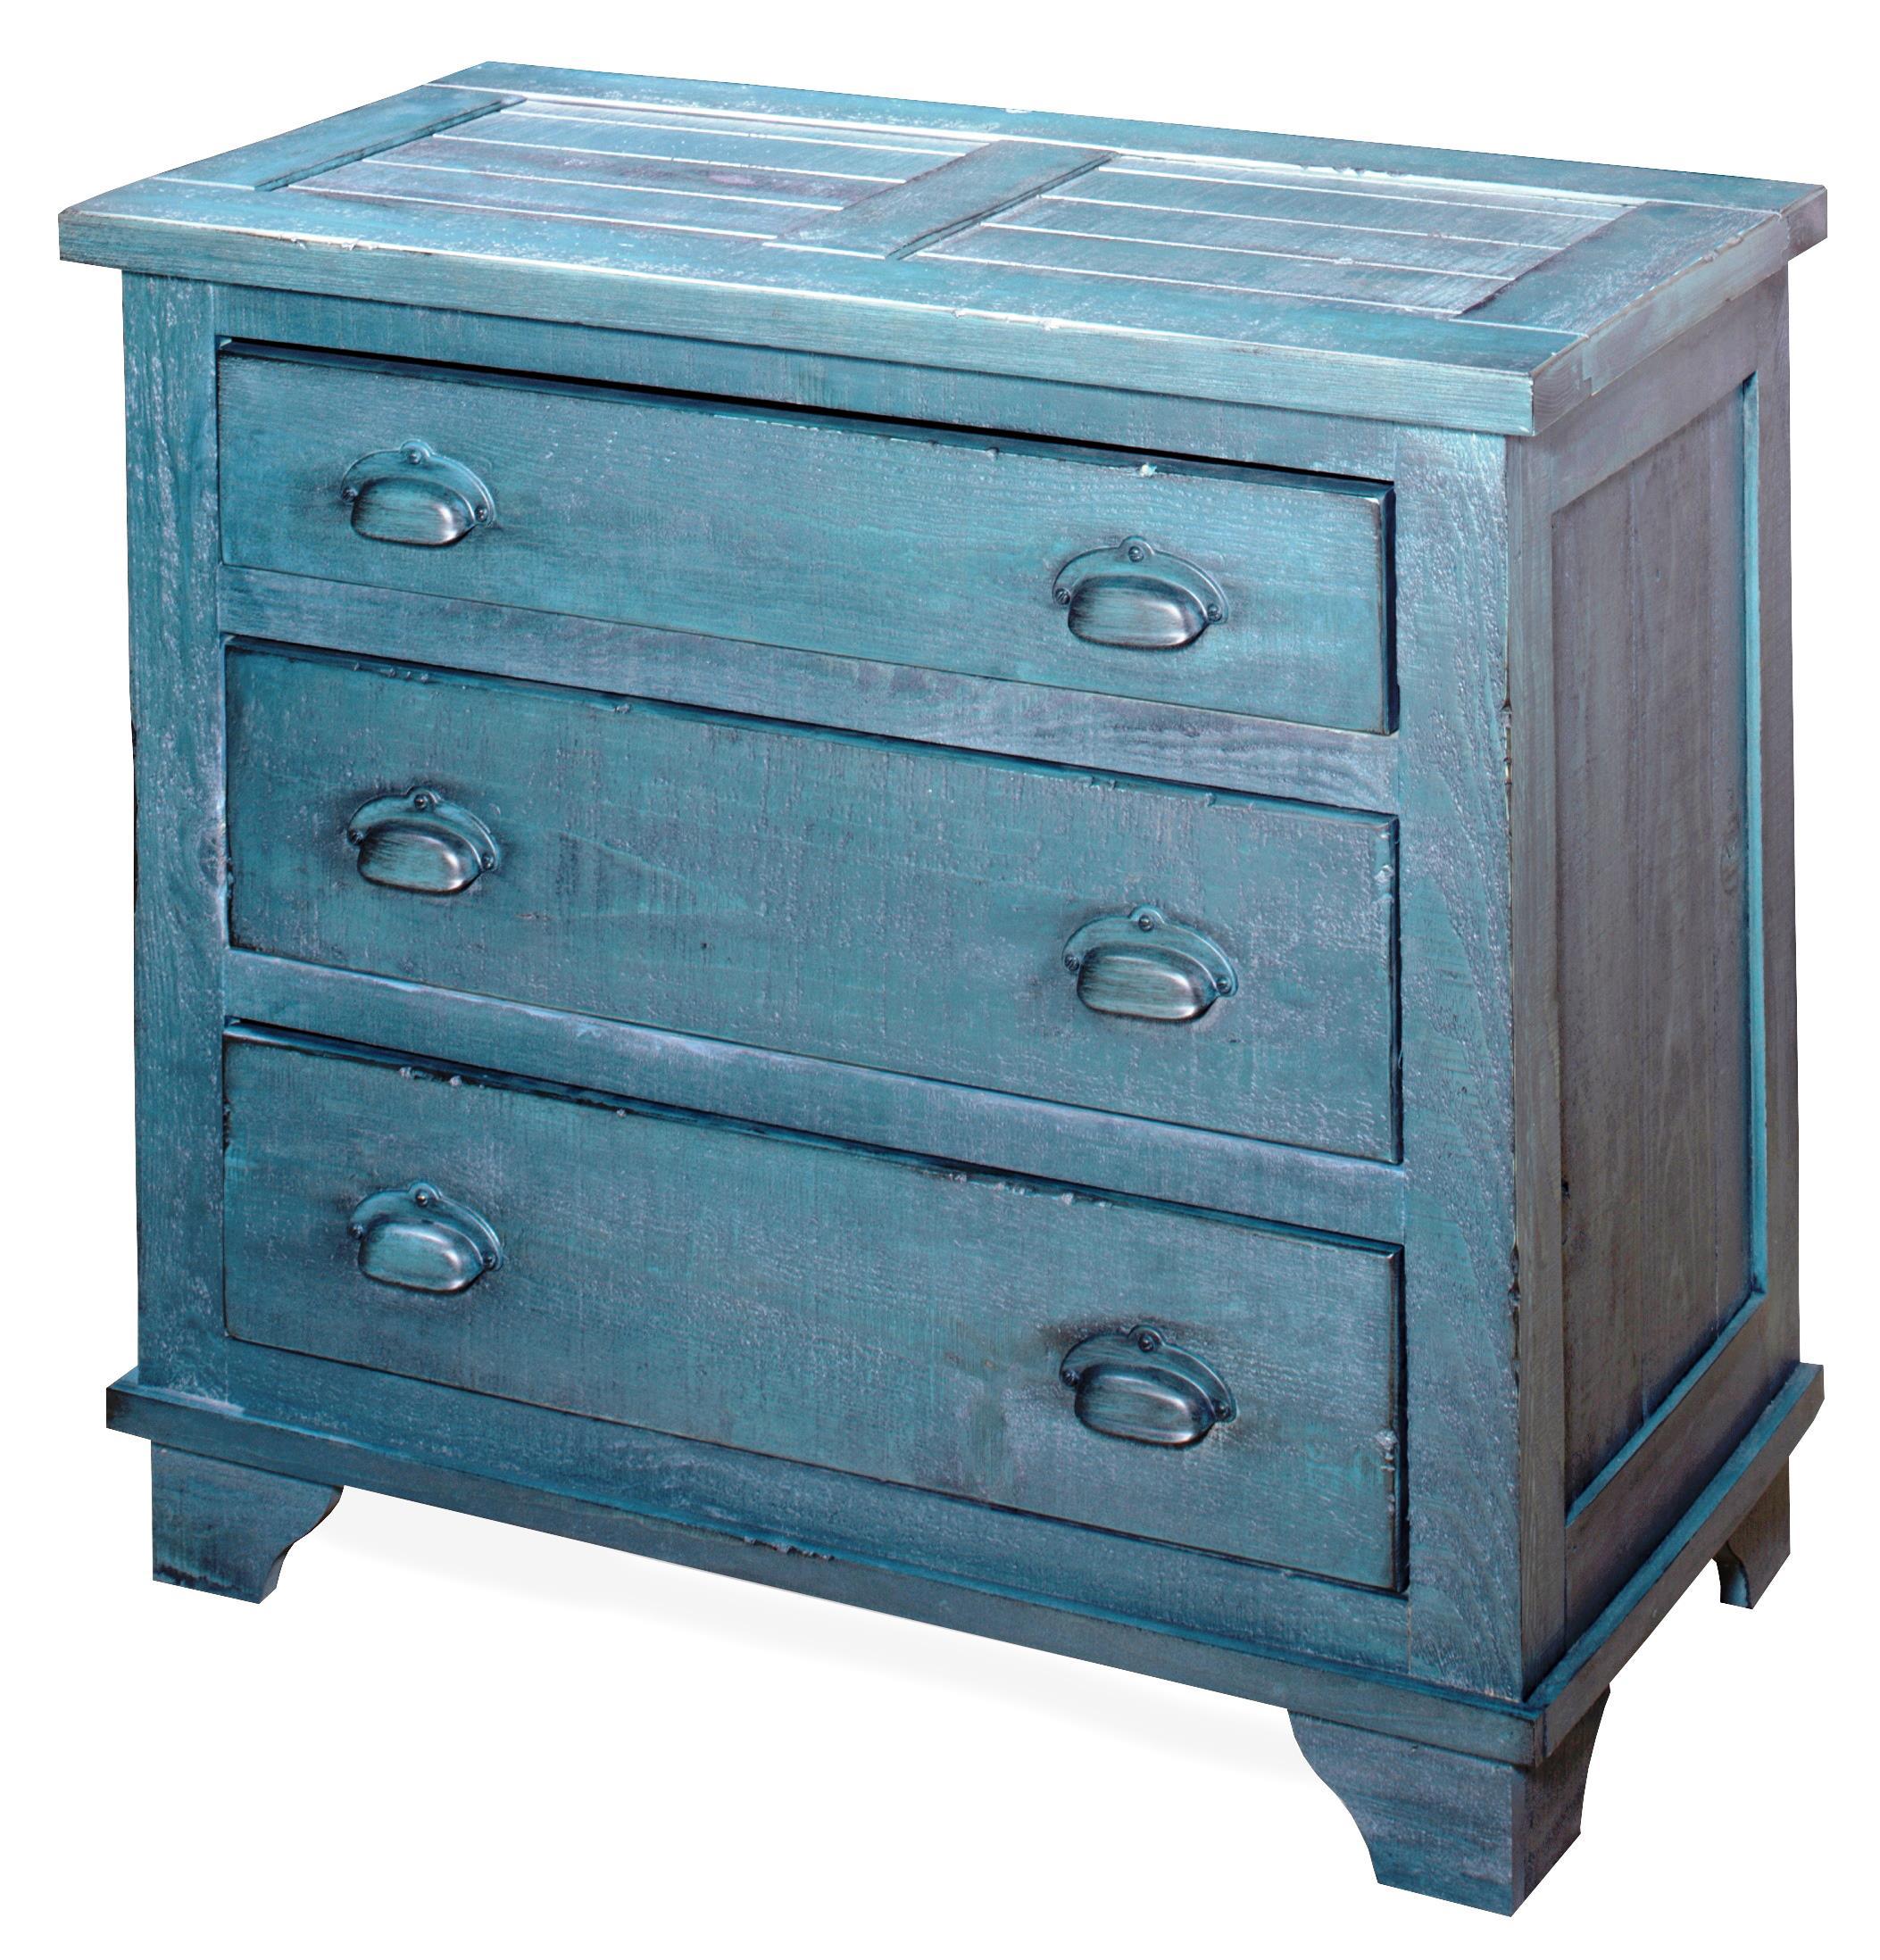 Progressive Furniture Camryn Industrial Chest - Denim Blue - Item Number: A724-72D